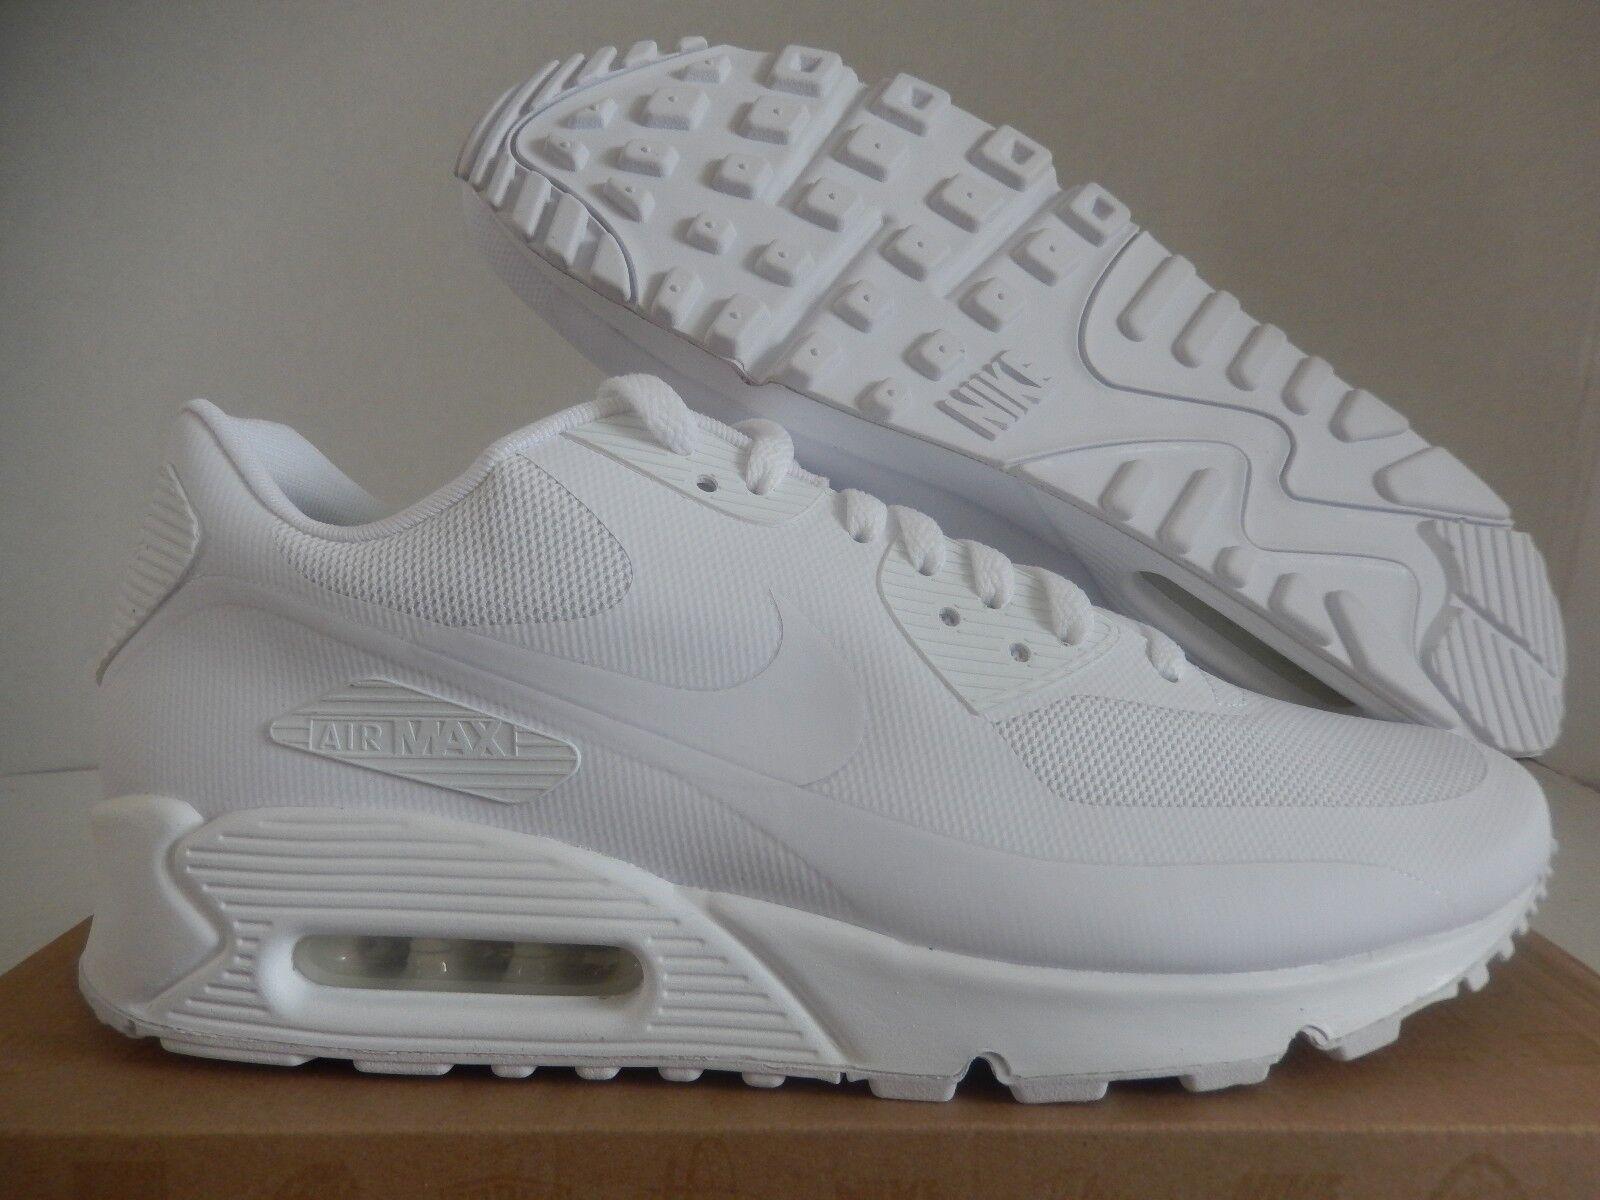 345be4b0921bd5 Nike Air Max 90 HYP Hyperfuse QS